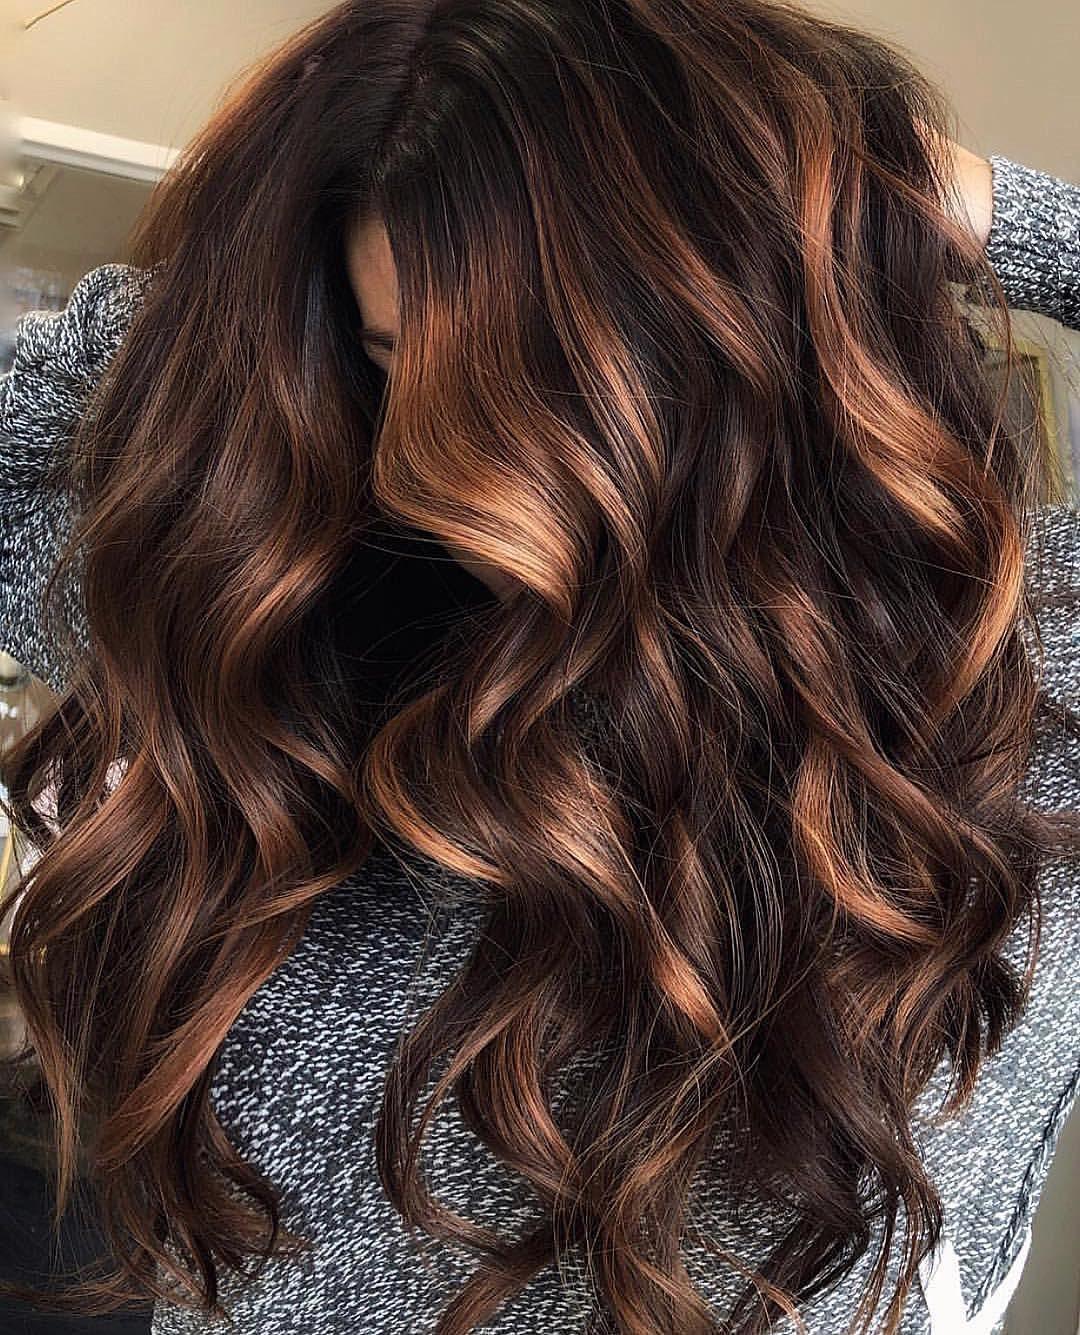 Low Maintenance Brunette Hair Color On Fine Dark Asian Brunette Hair Hair Color Asian Asian Hair Hair Highlights